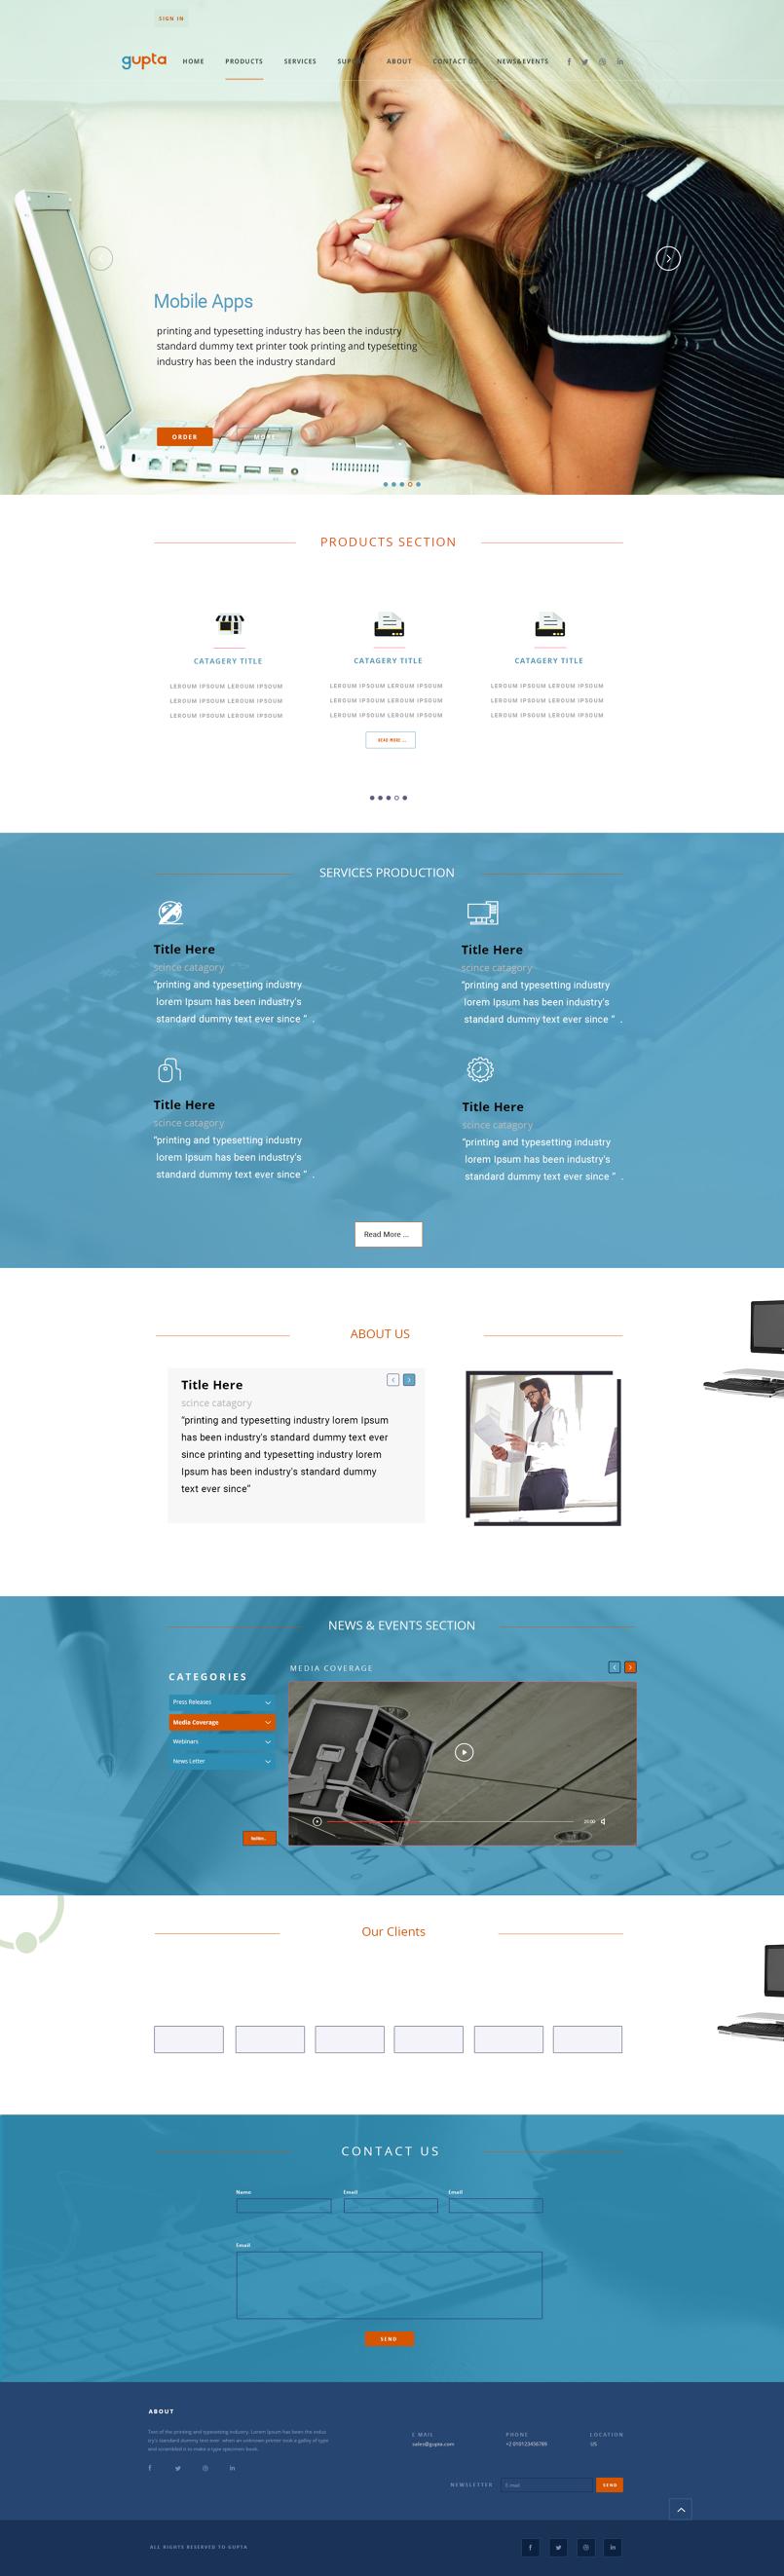 gupta-web-site